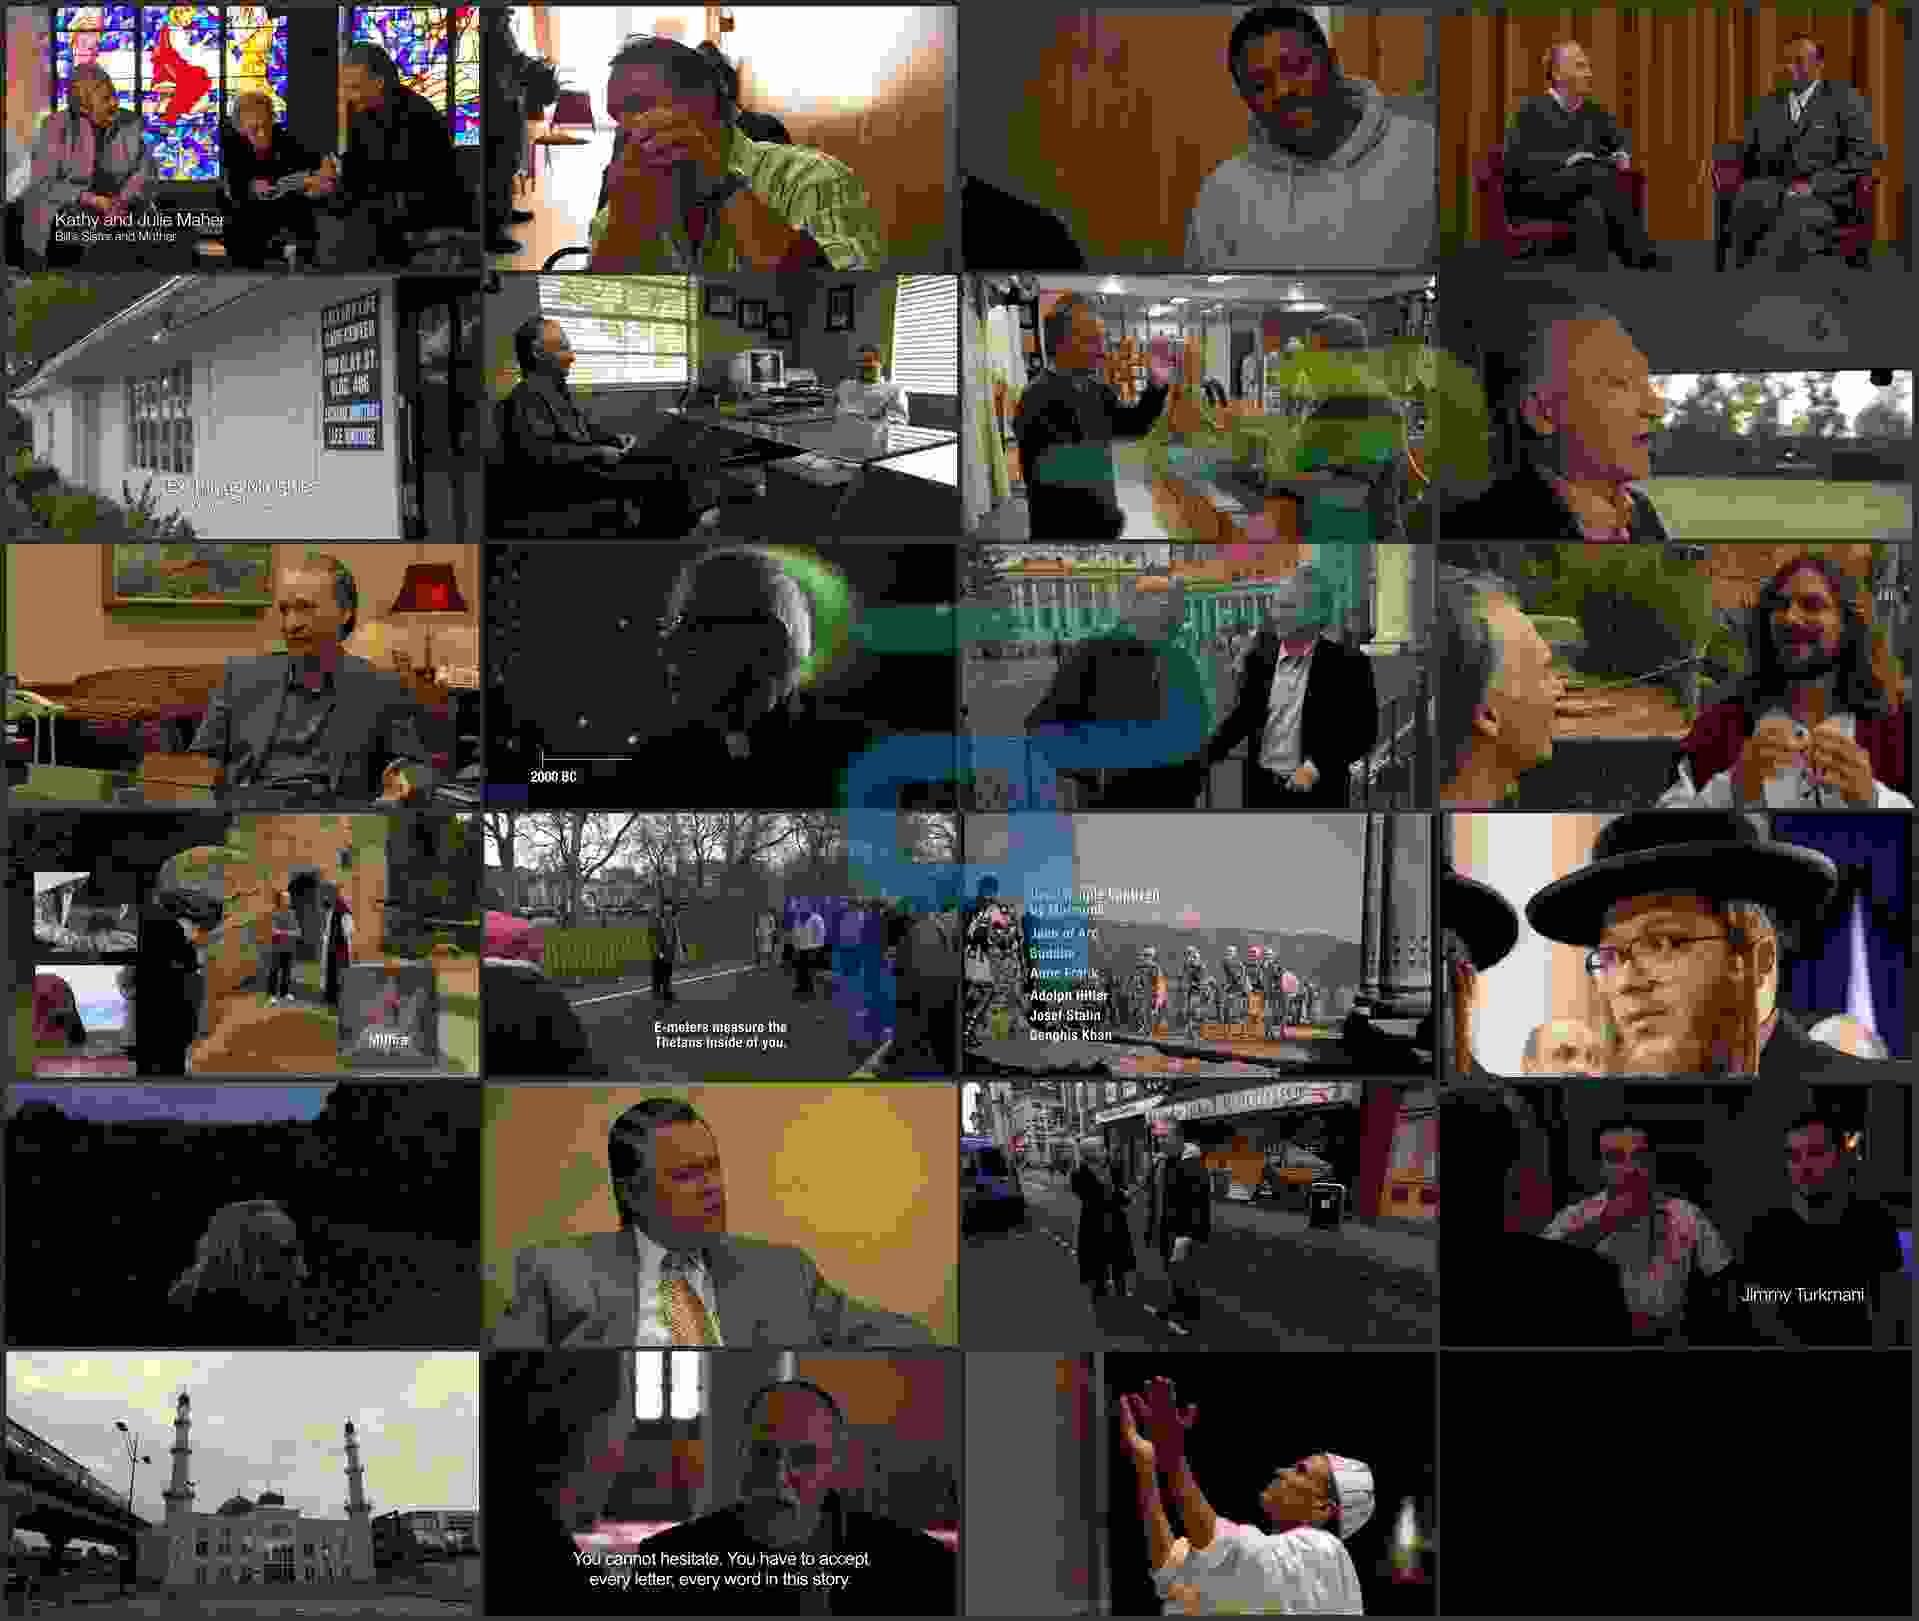 Religulous_2008_1080p_BluRay__www.download.ir.mp4 (Copy)